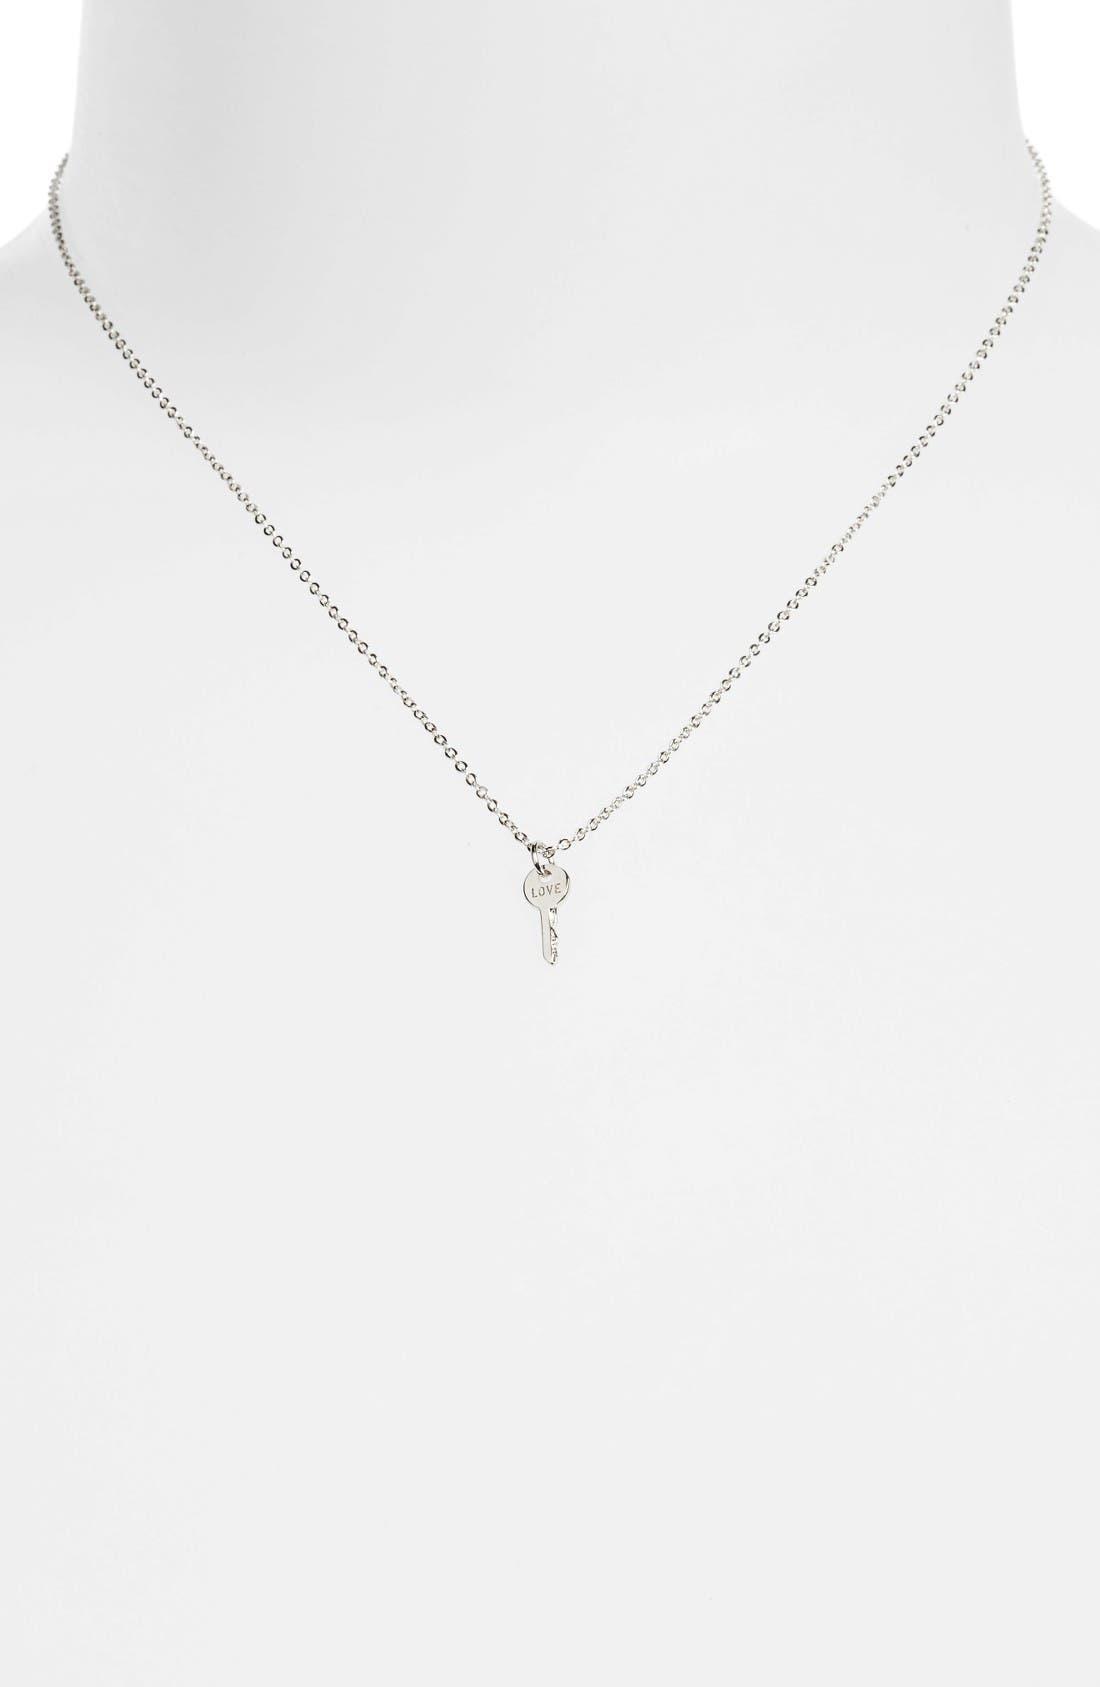 The Giving Keys Love Mini Key Necklace